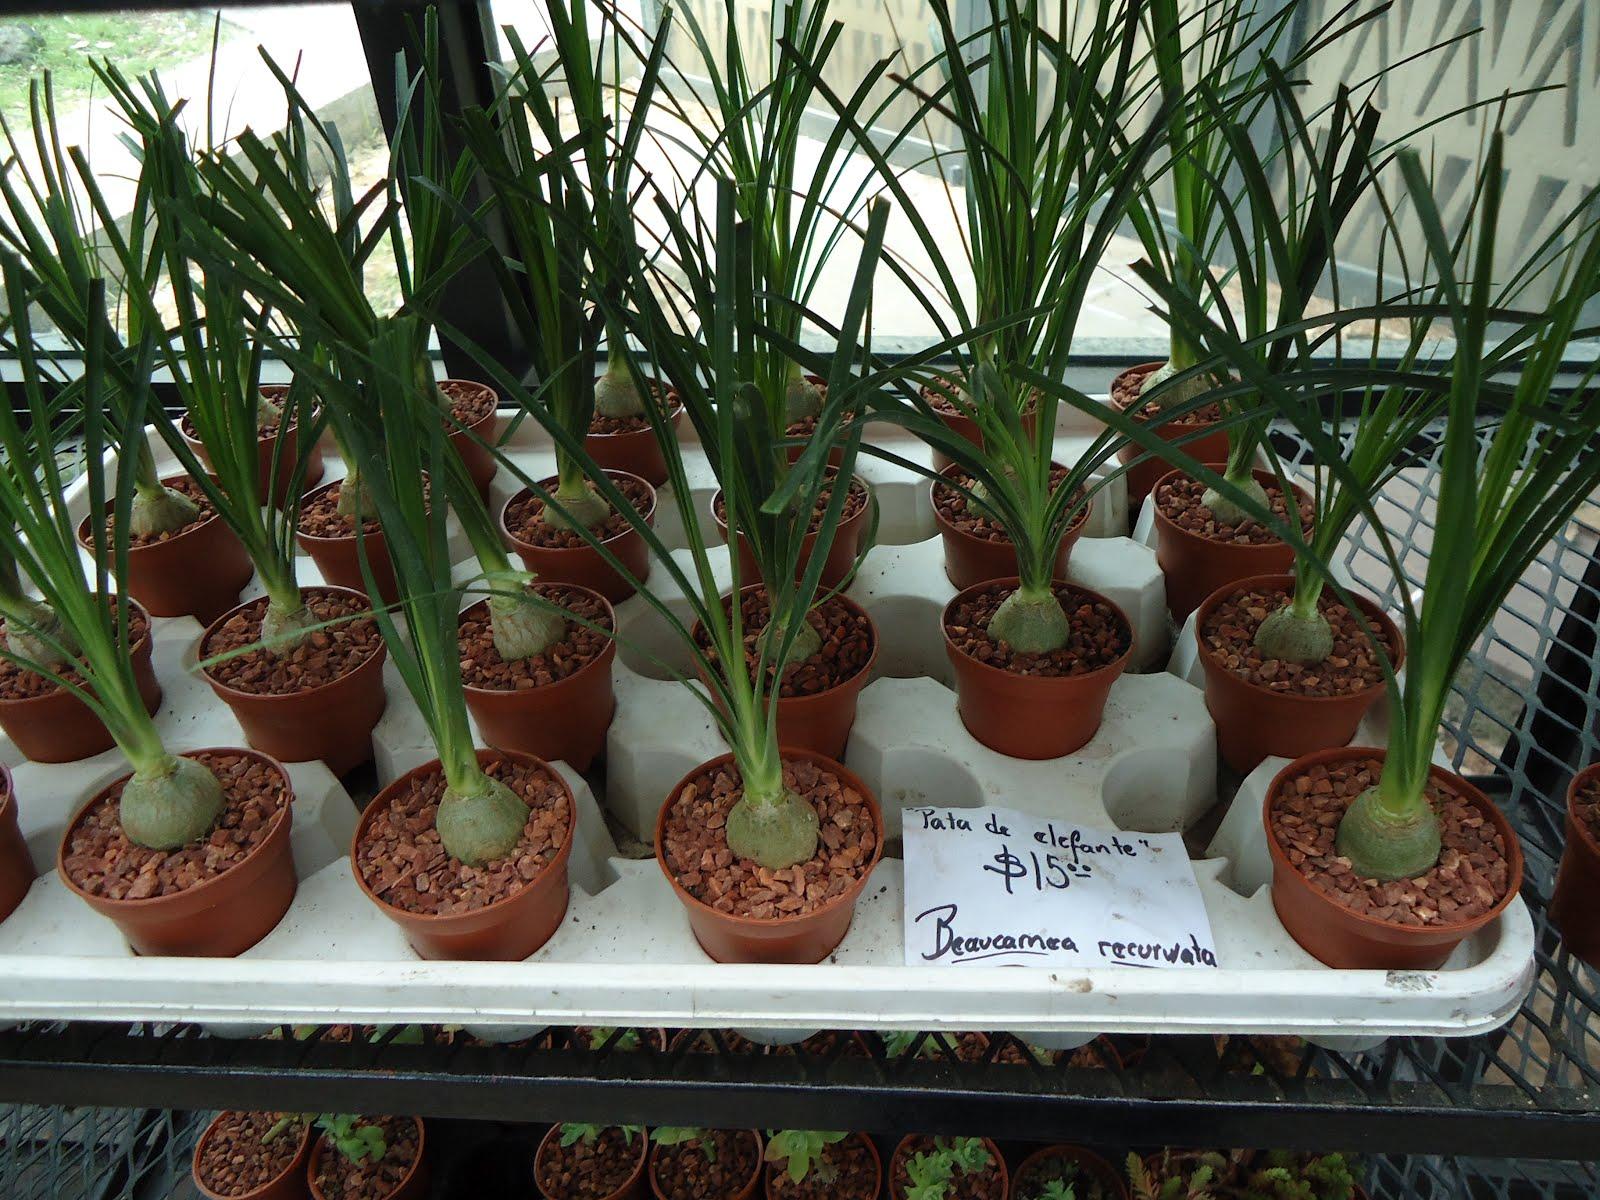 Aunam festejar la unam a su jard n bot nico for Jardin botanico unam 2015